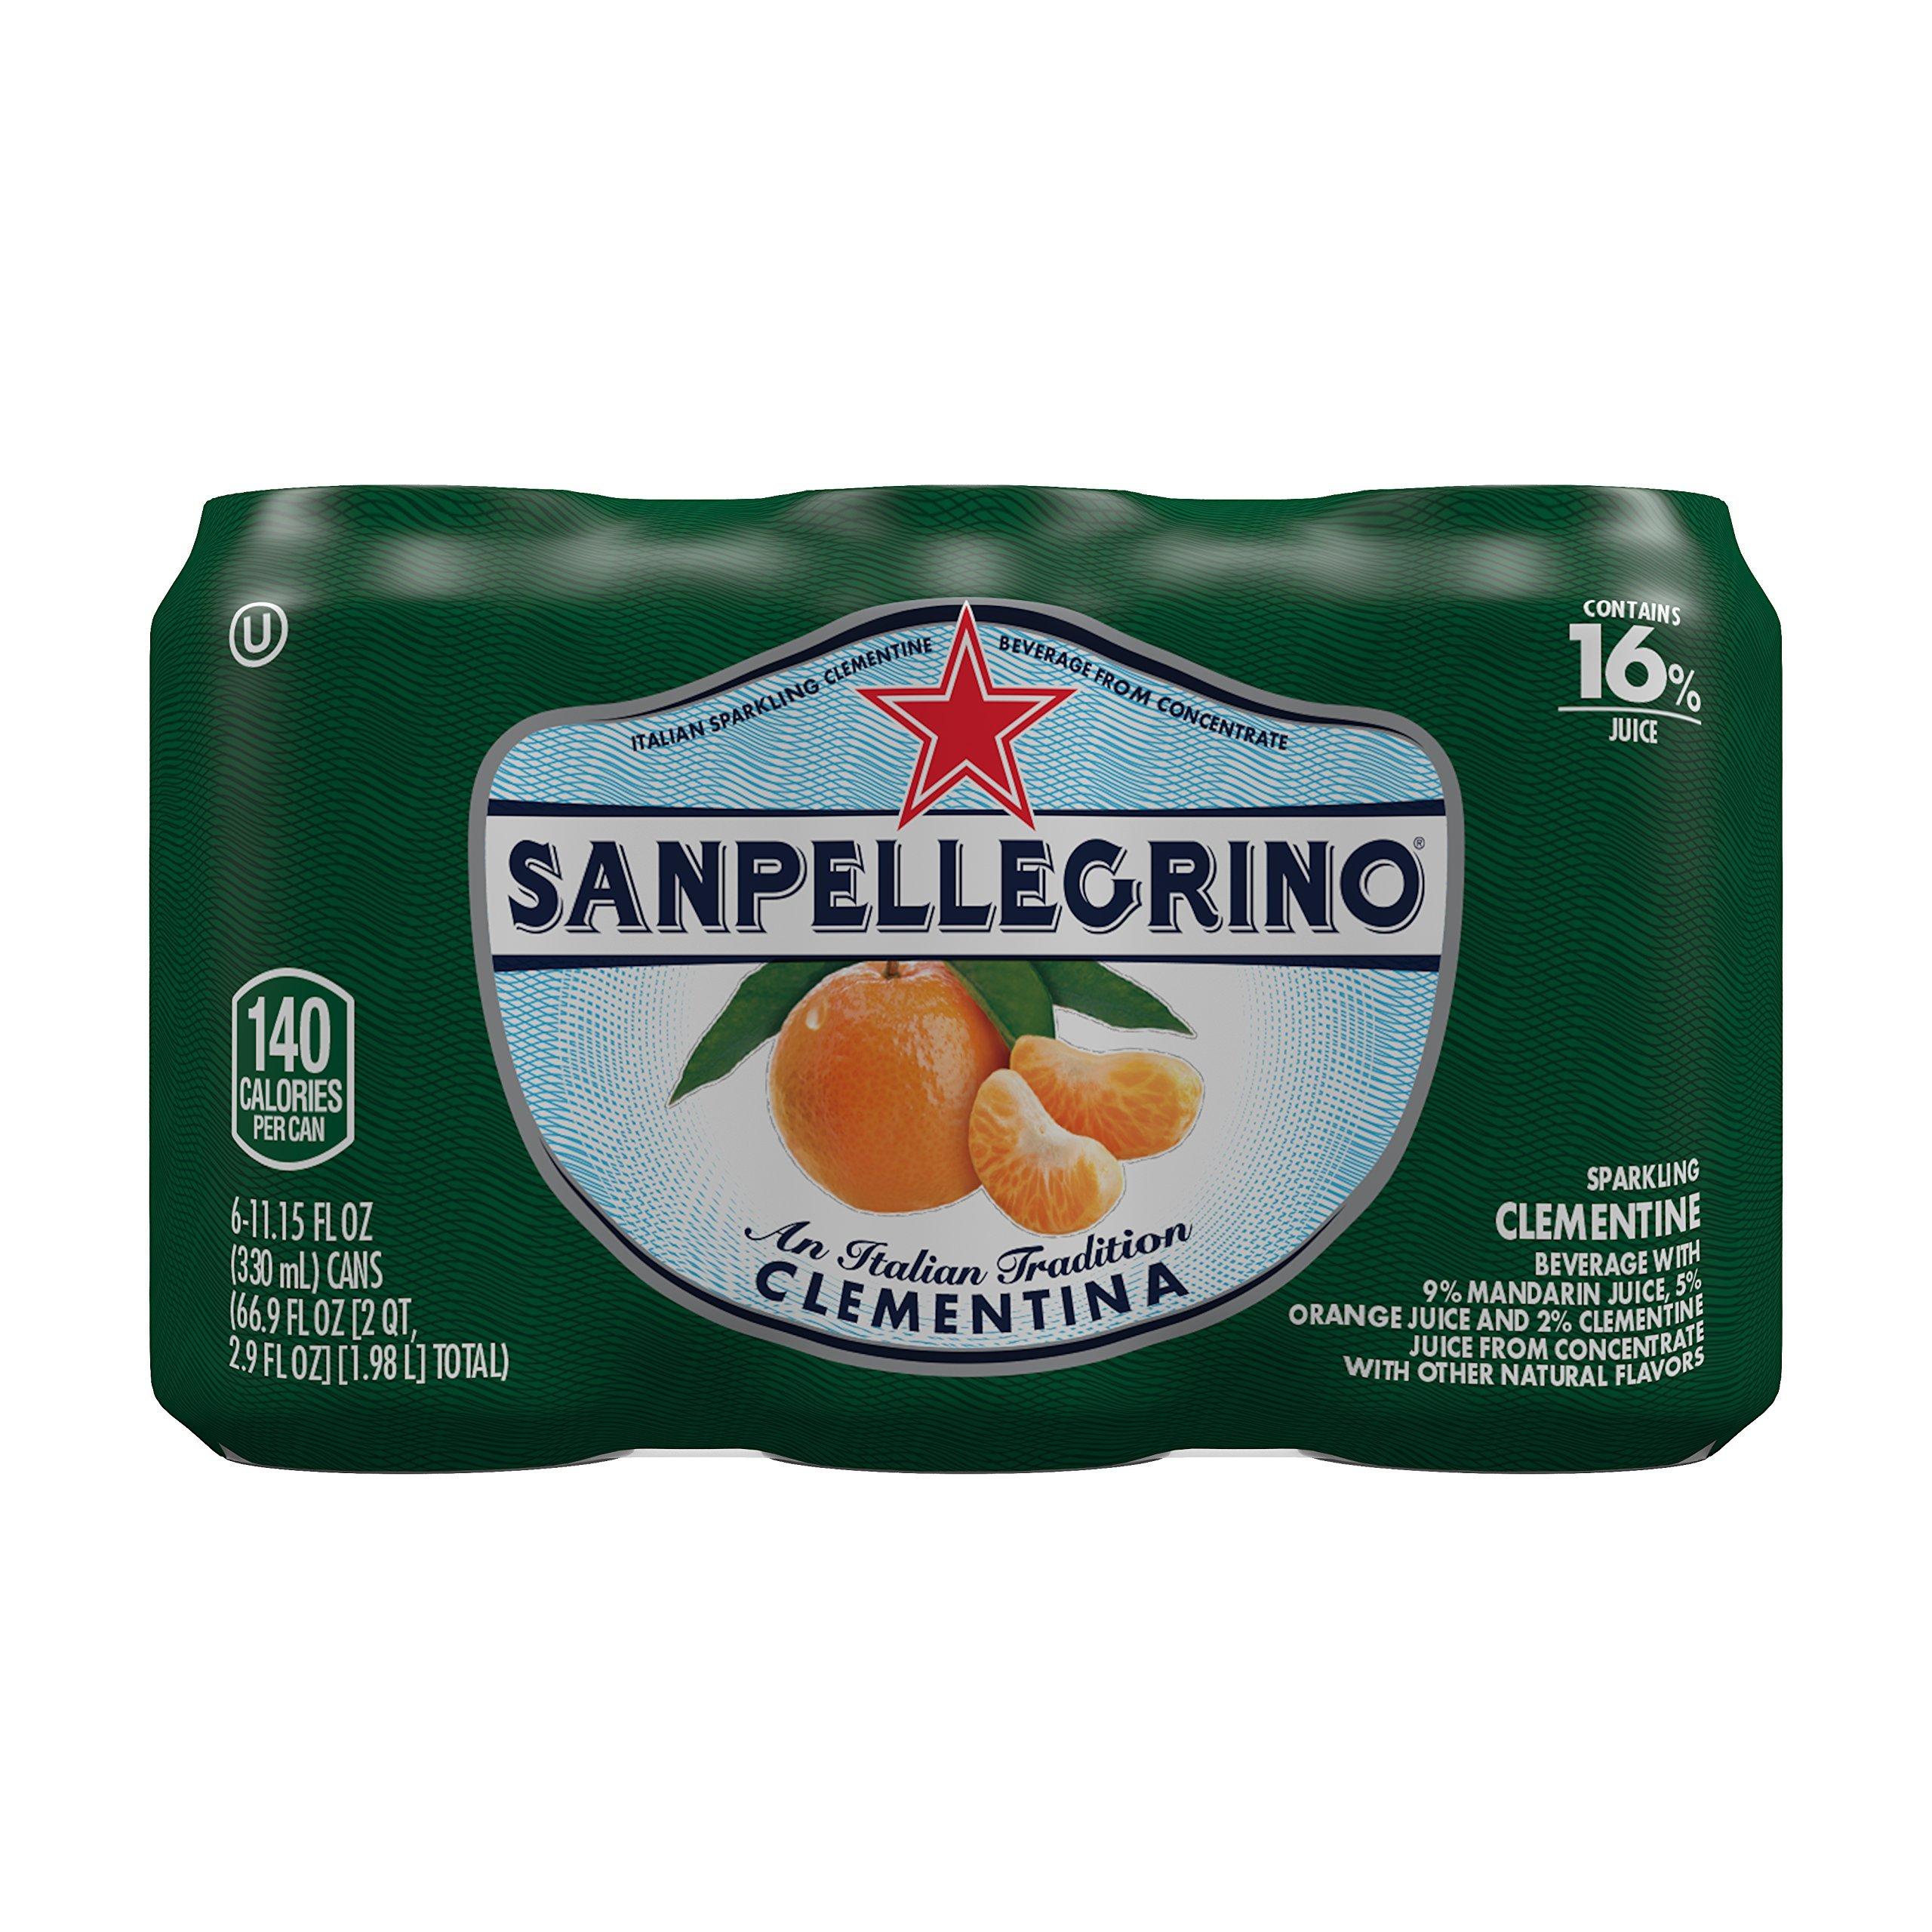 Sanpellegrino Clementine Sparkling Fruit Beverage, 11.15 fl oz. Cans (6 Count)